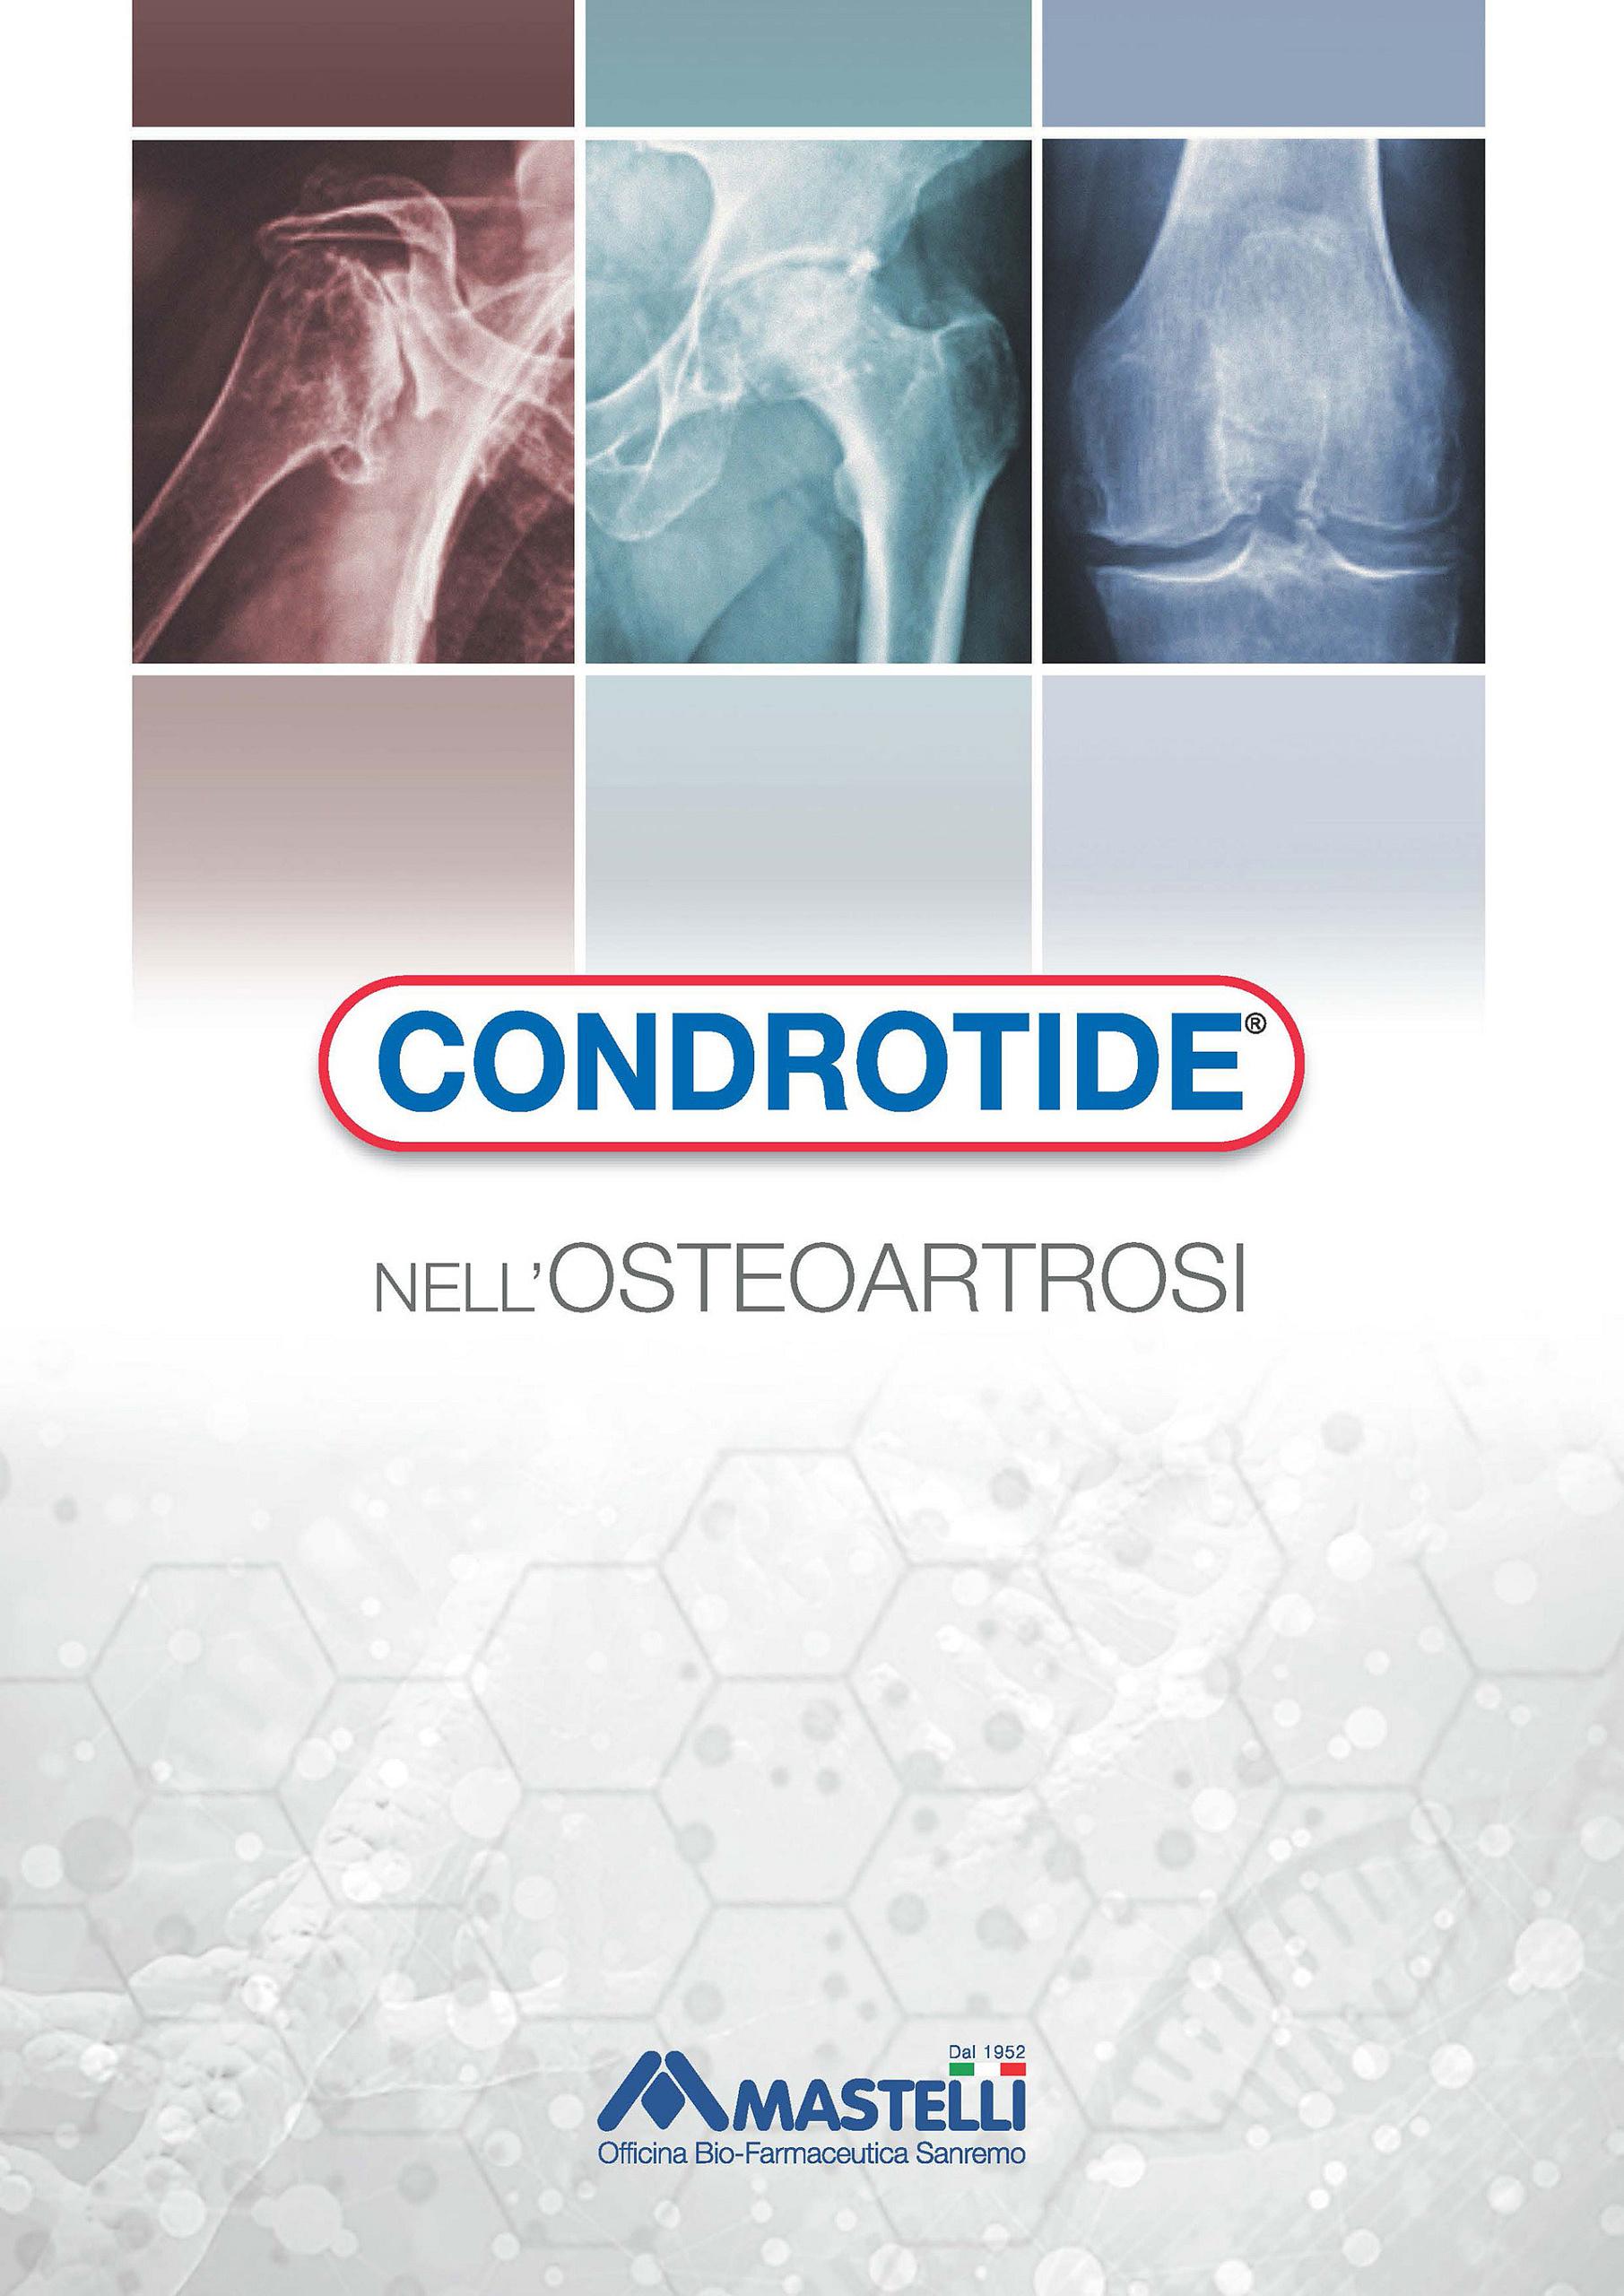 Condrotide